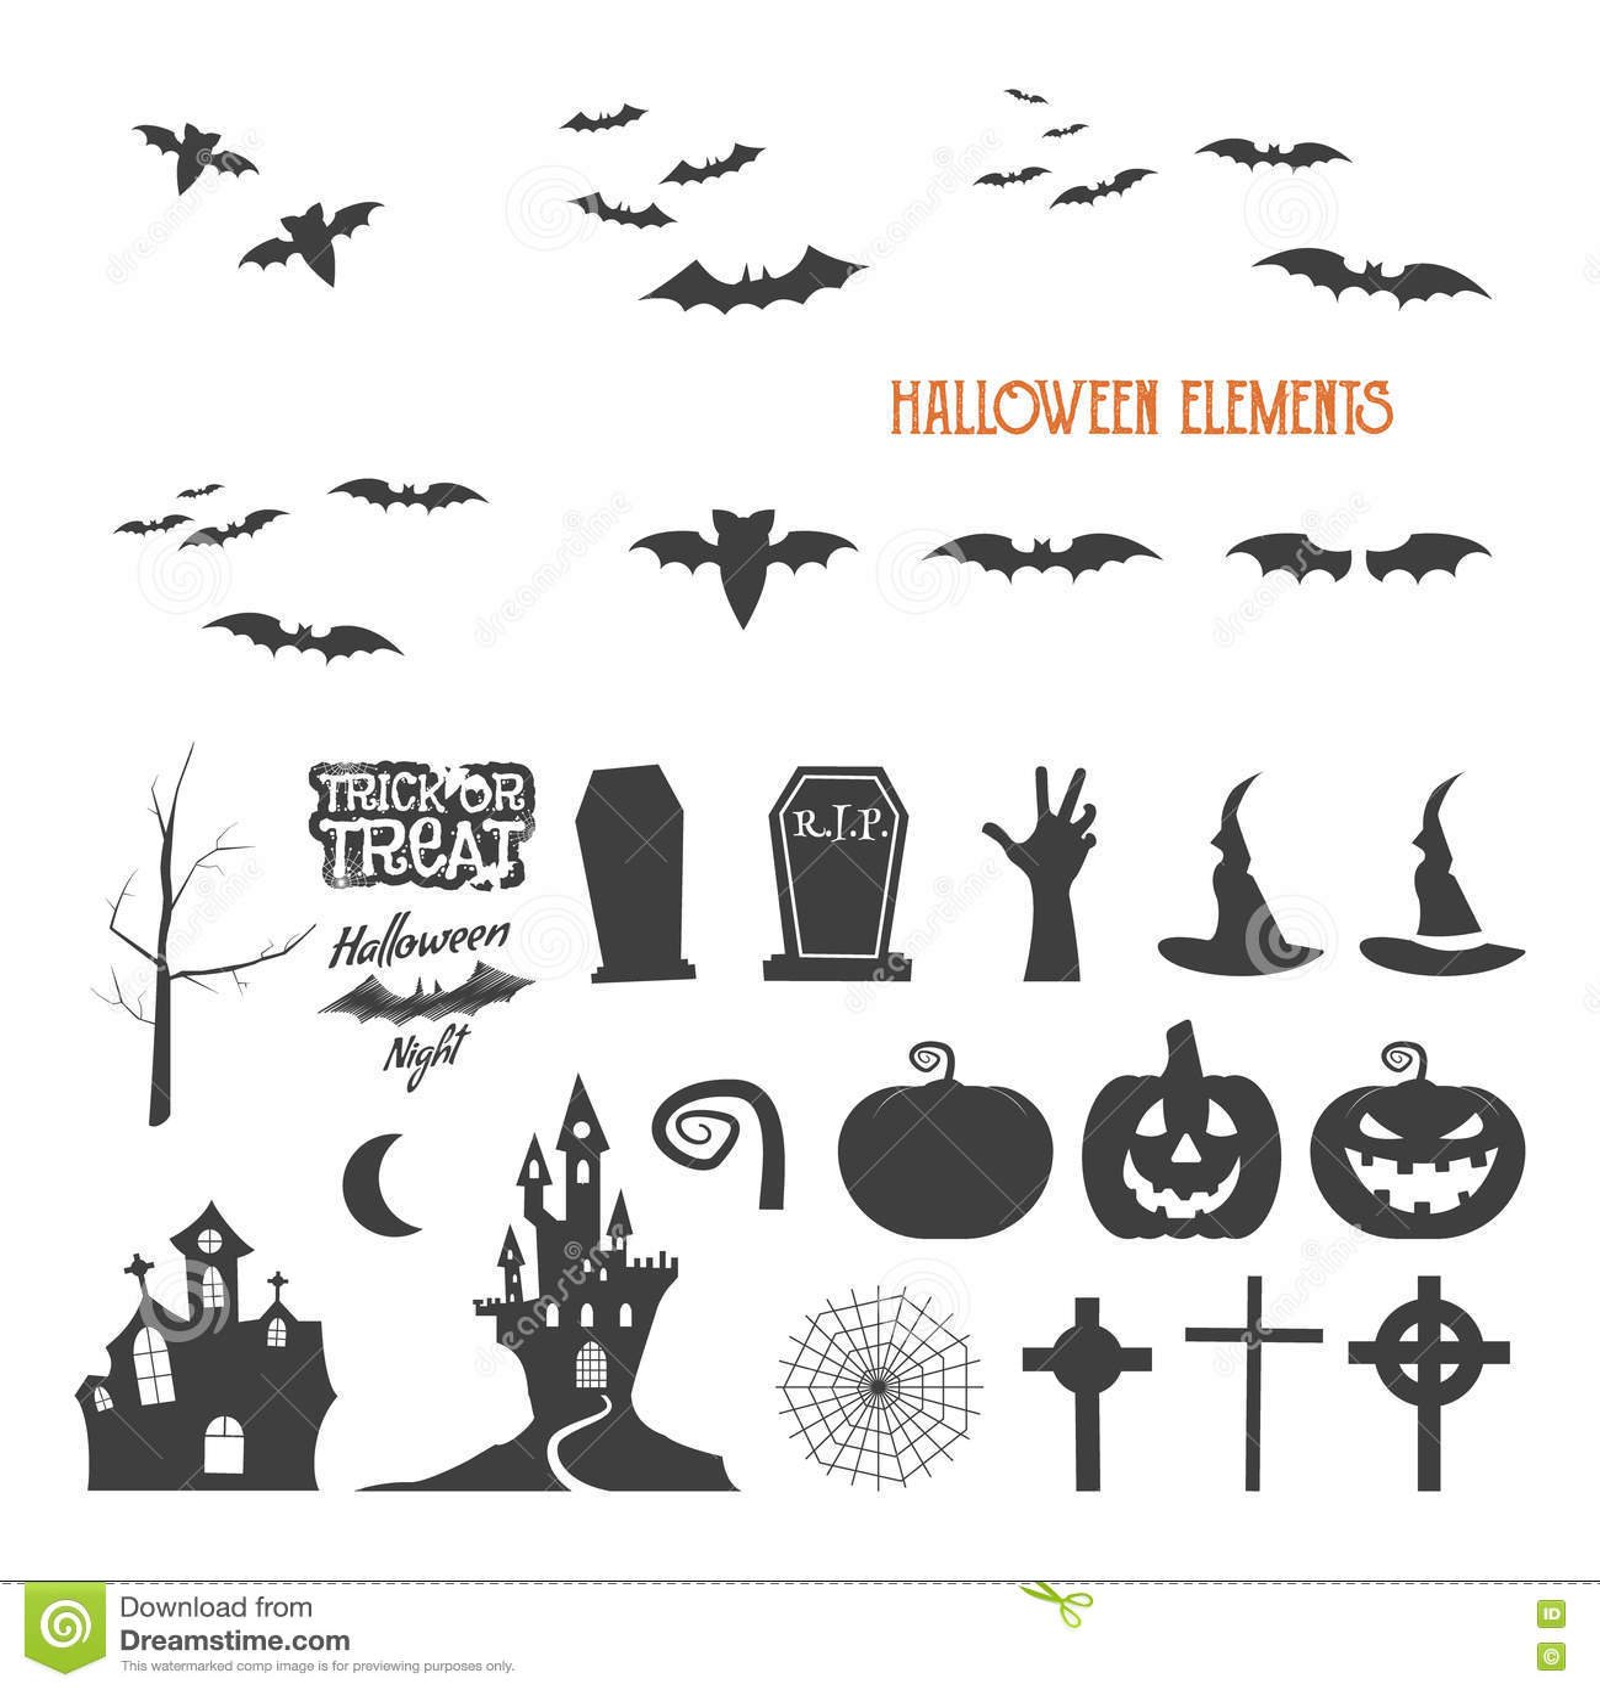 Set of halloween design creation tool kit icons isolate flat set of halloween design creation tool kit icons isolate flat holiday design creator party symbols pumpkin bat buycottarizona Image collections